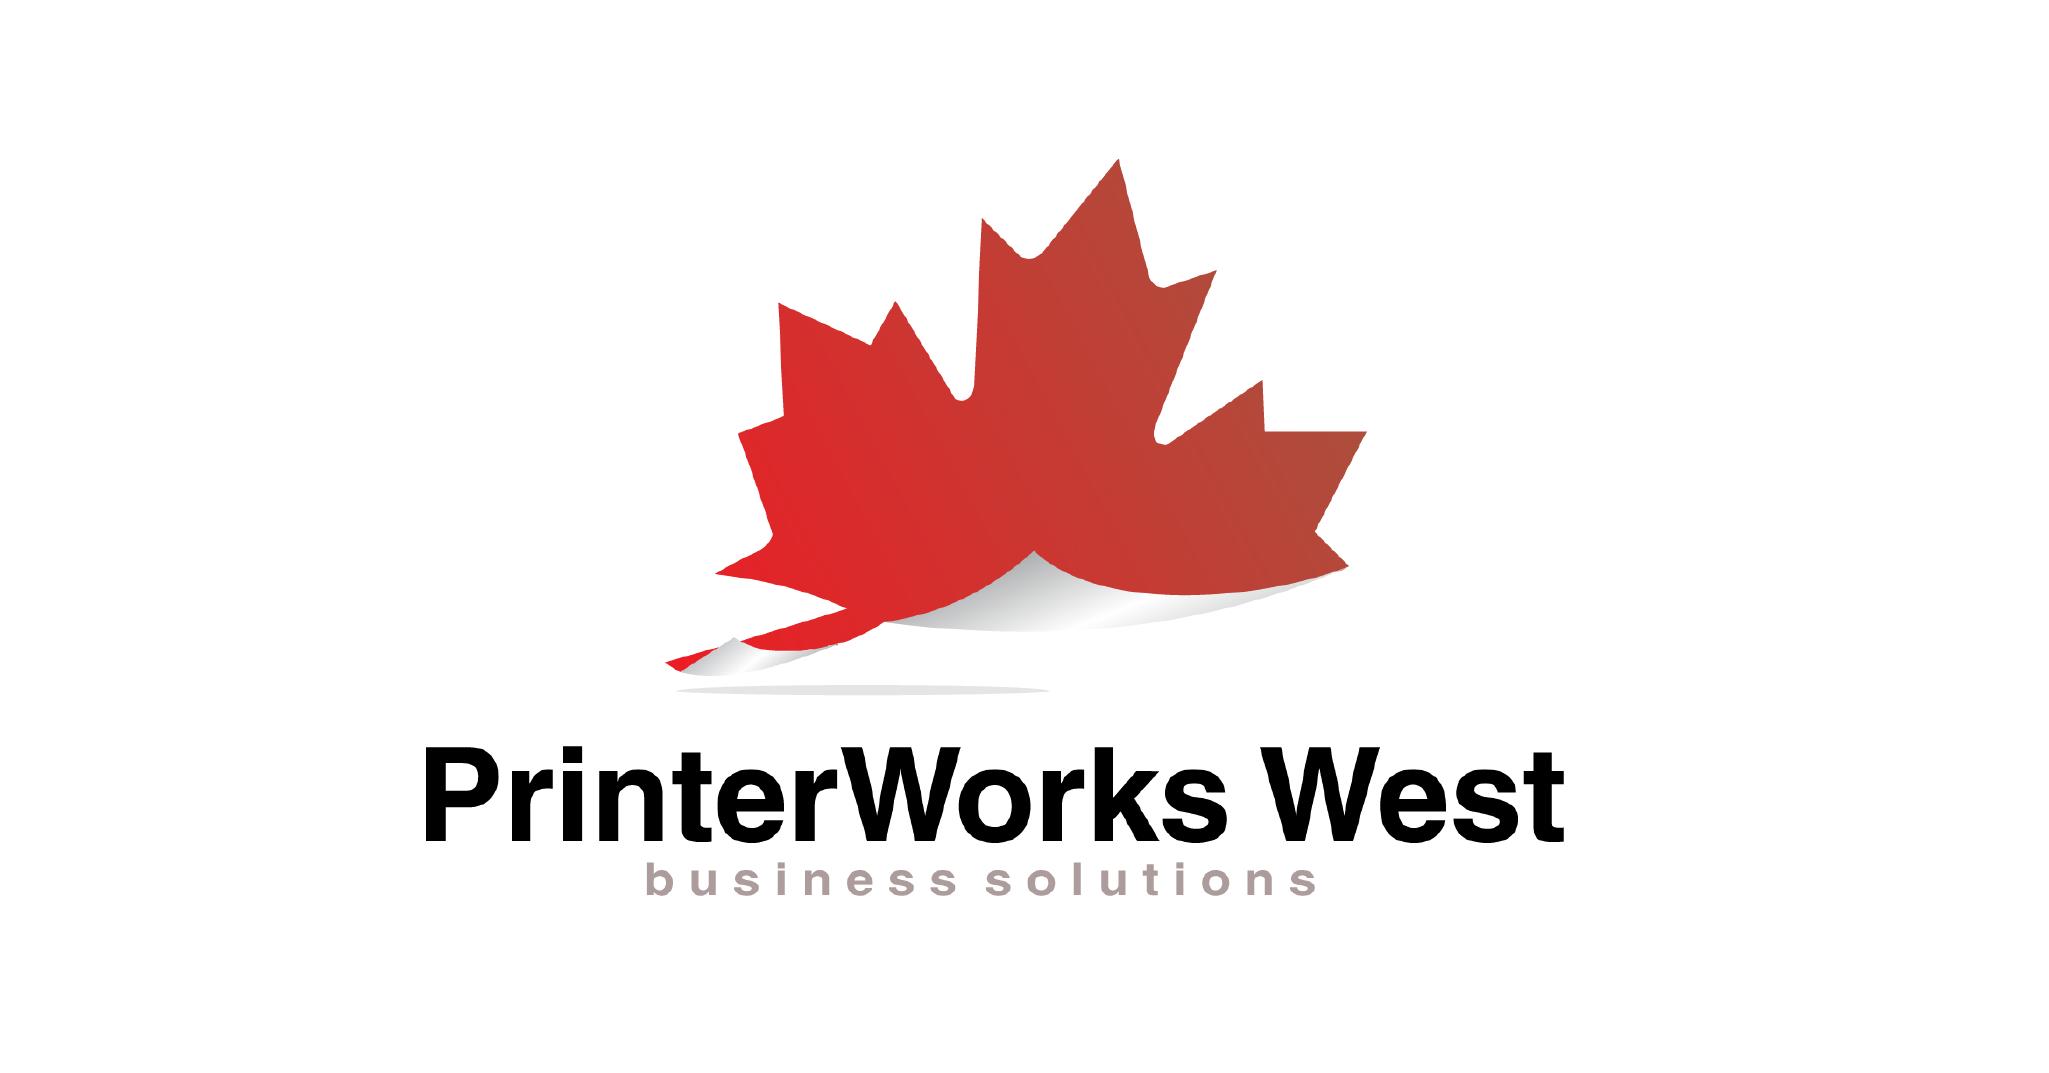 printerworks